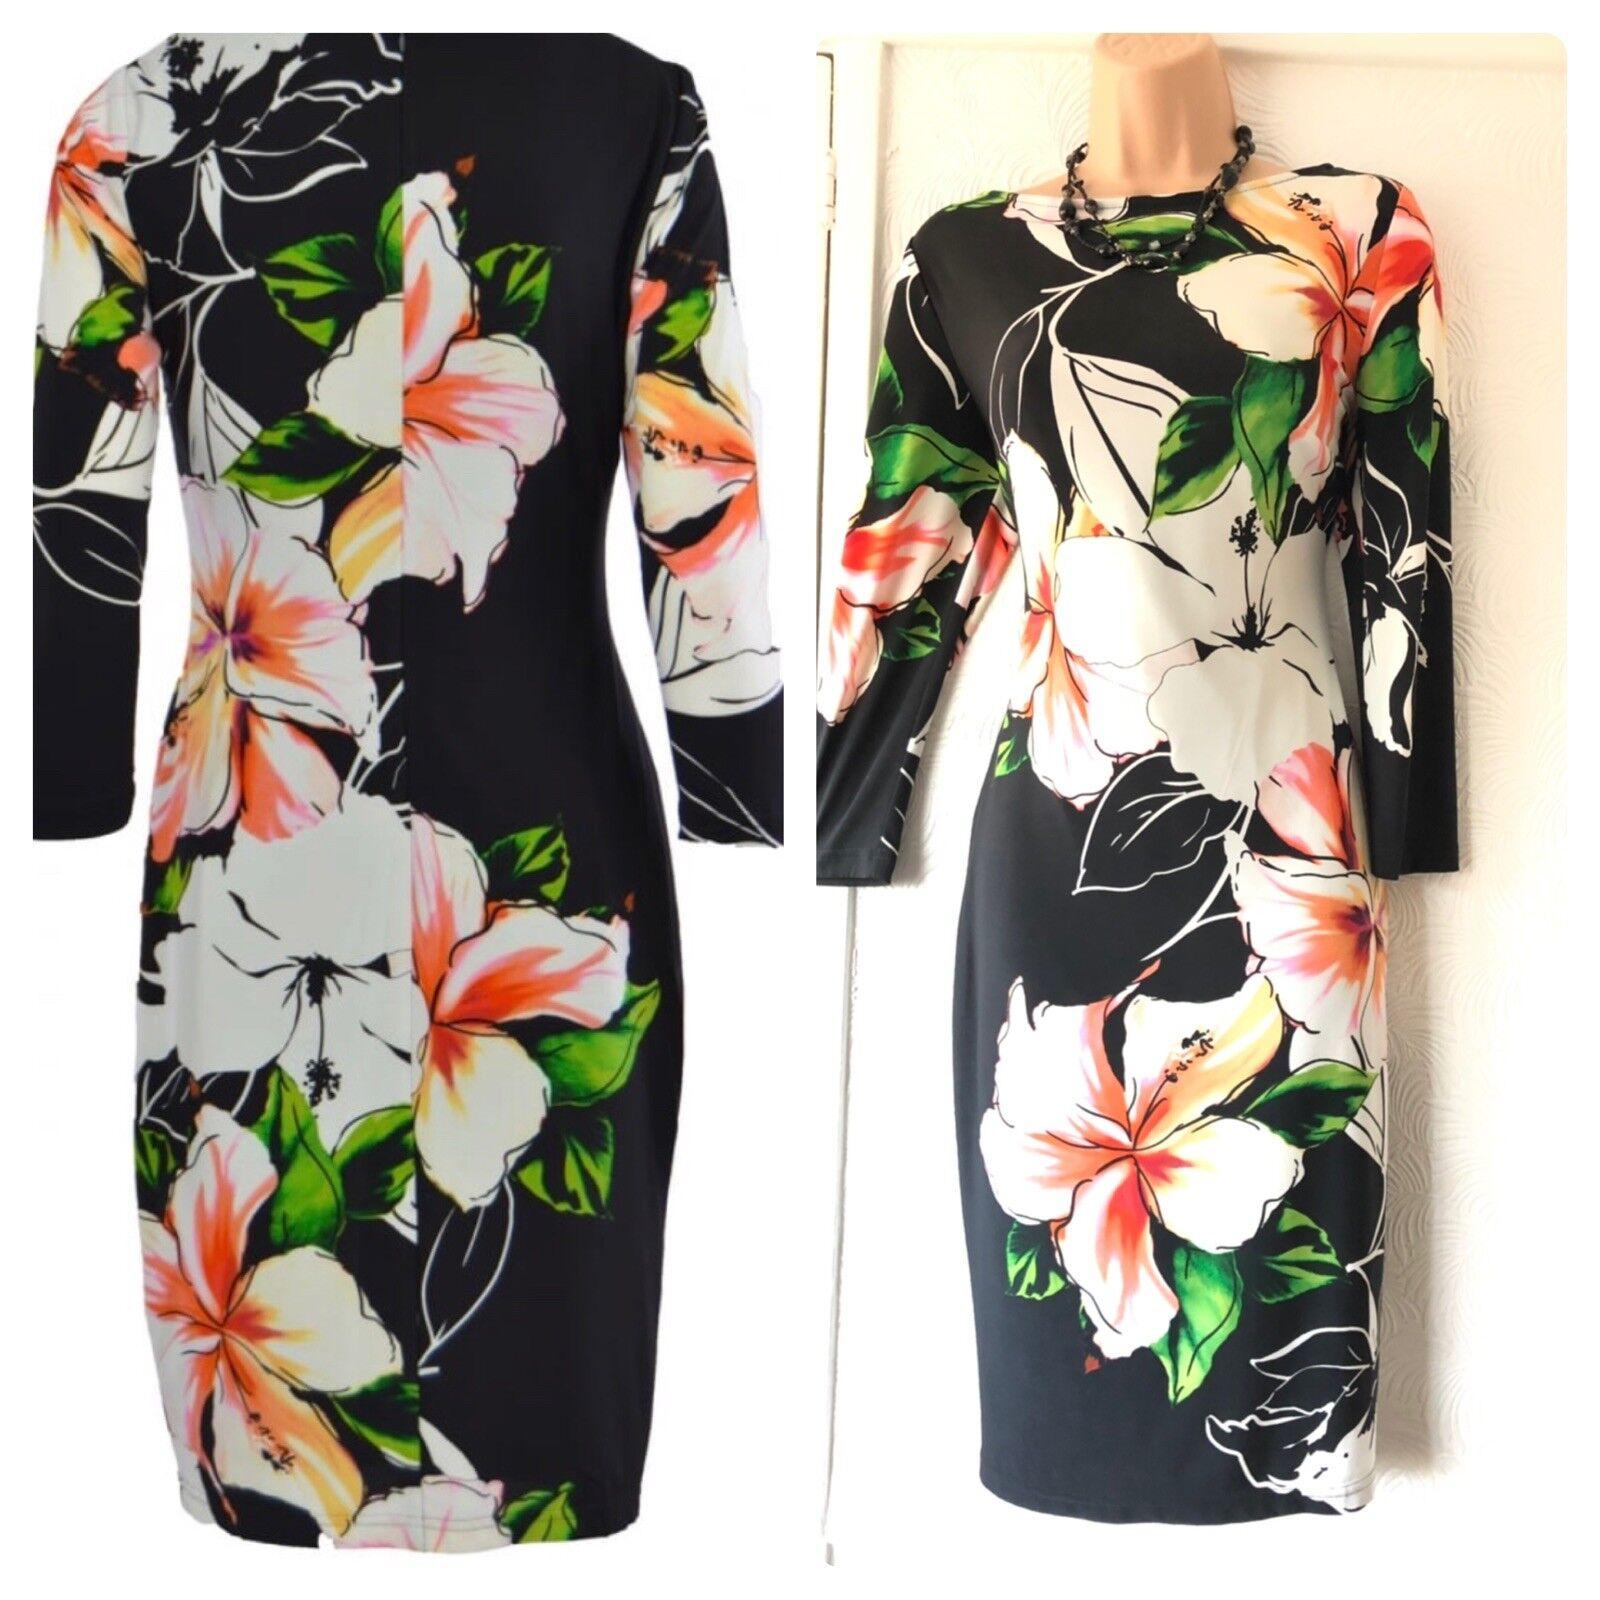 Beautiful Joseph Ribkoff Multi Colour Floral Stretchy Dress Size 12